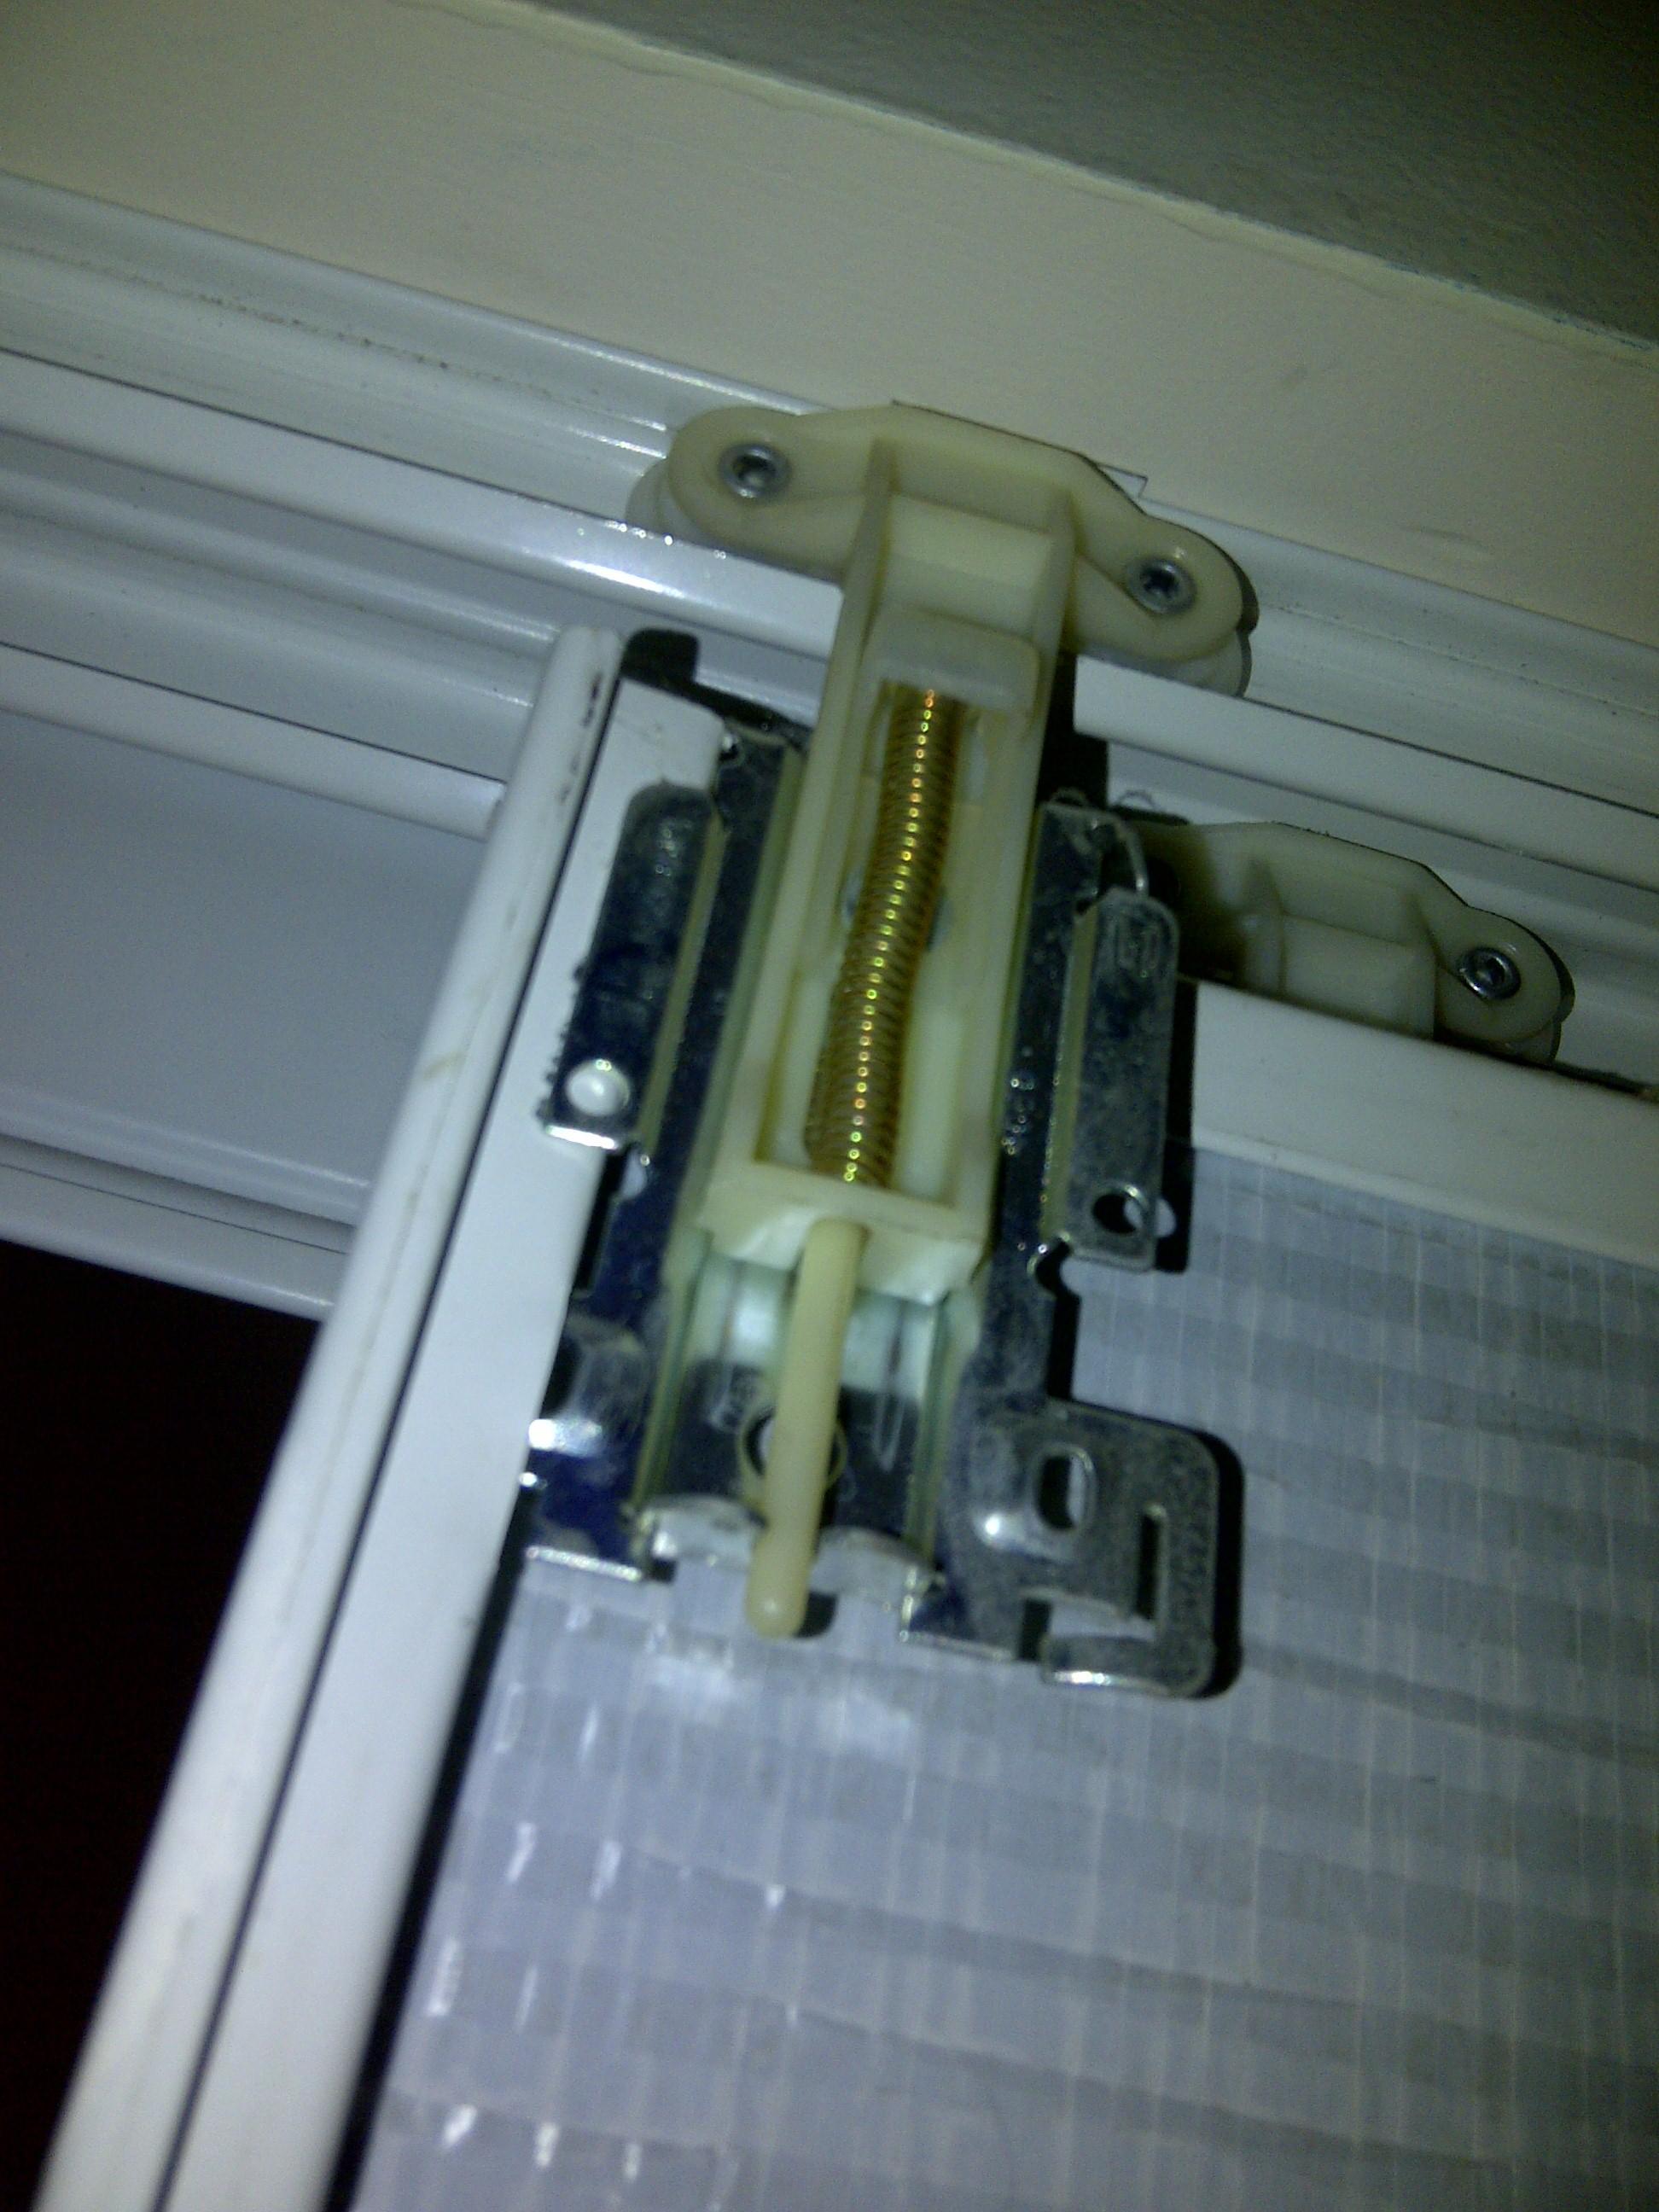 mirrored-sliding-closet-door-lock-photo-5